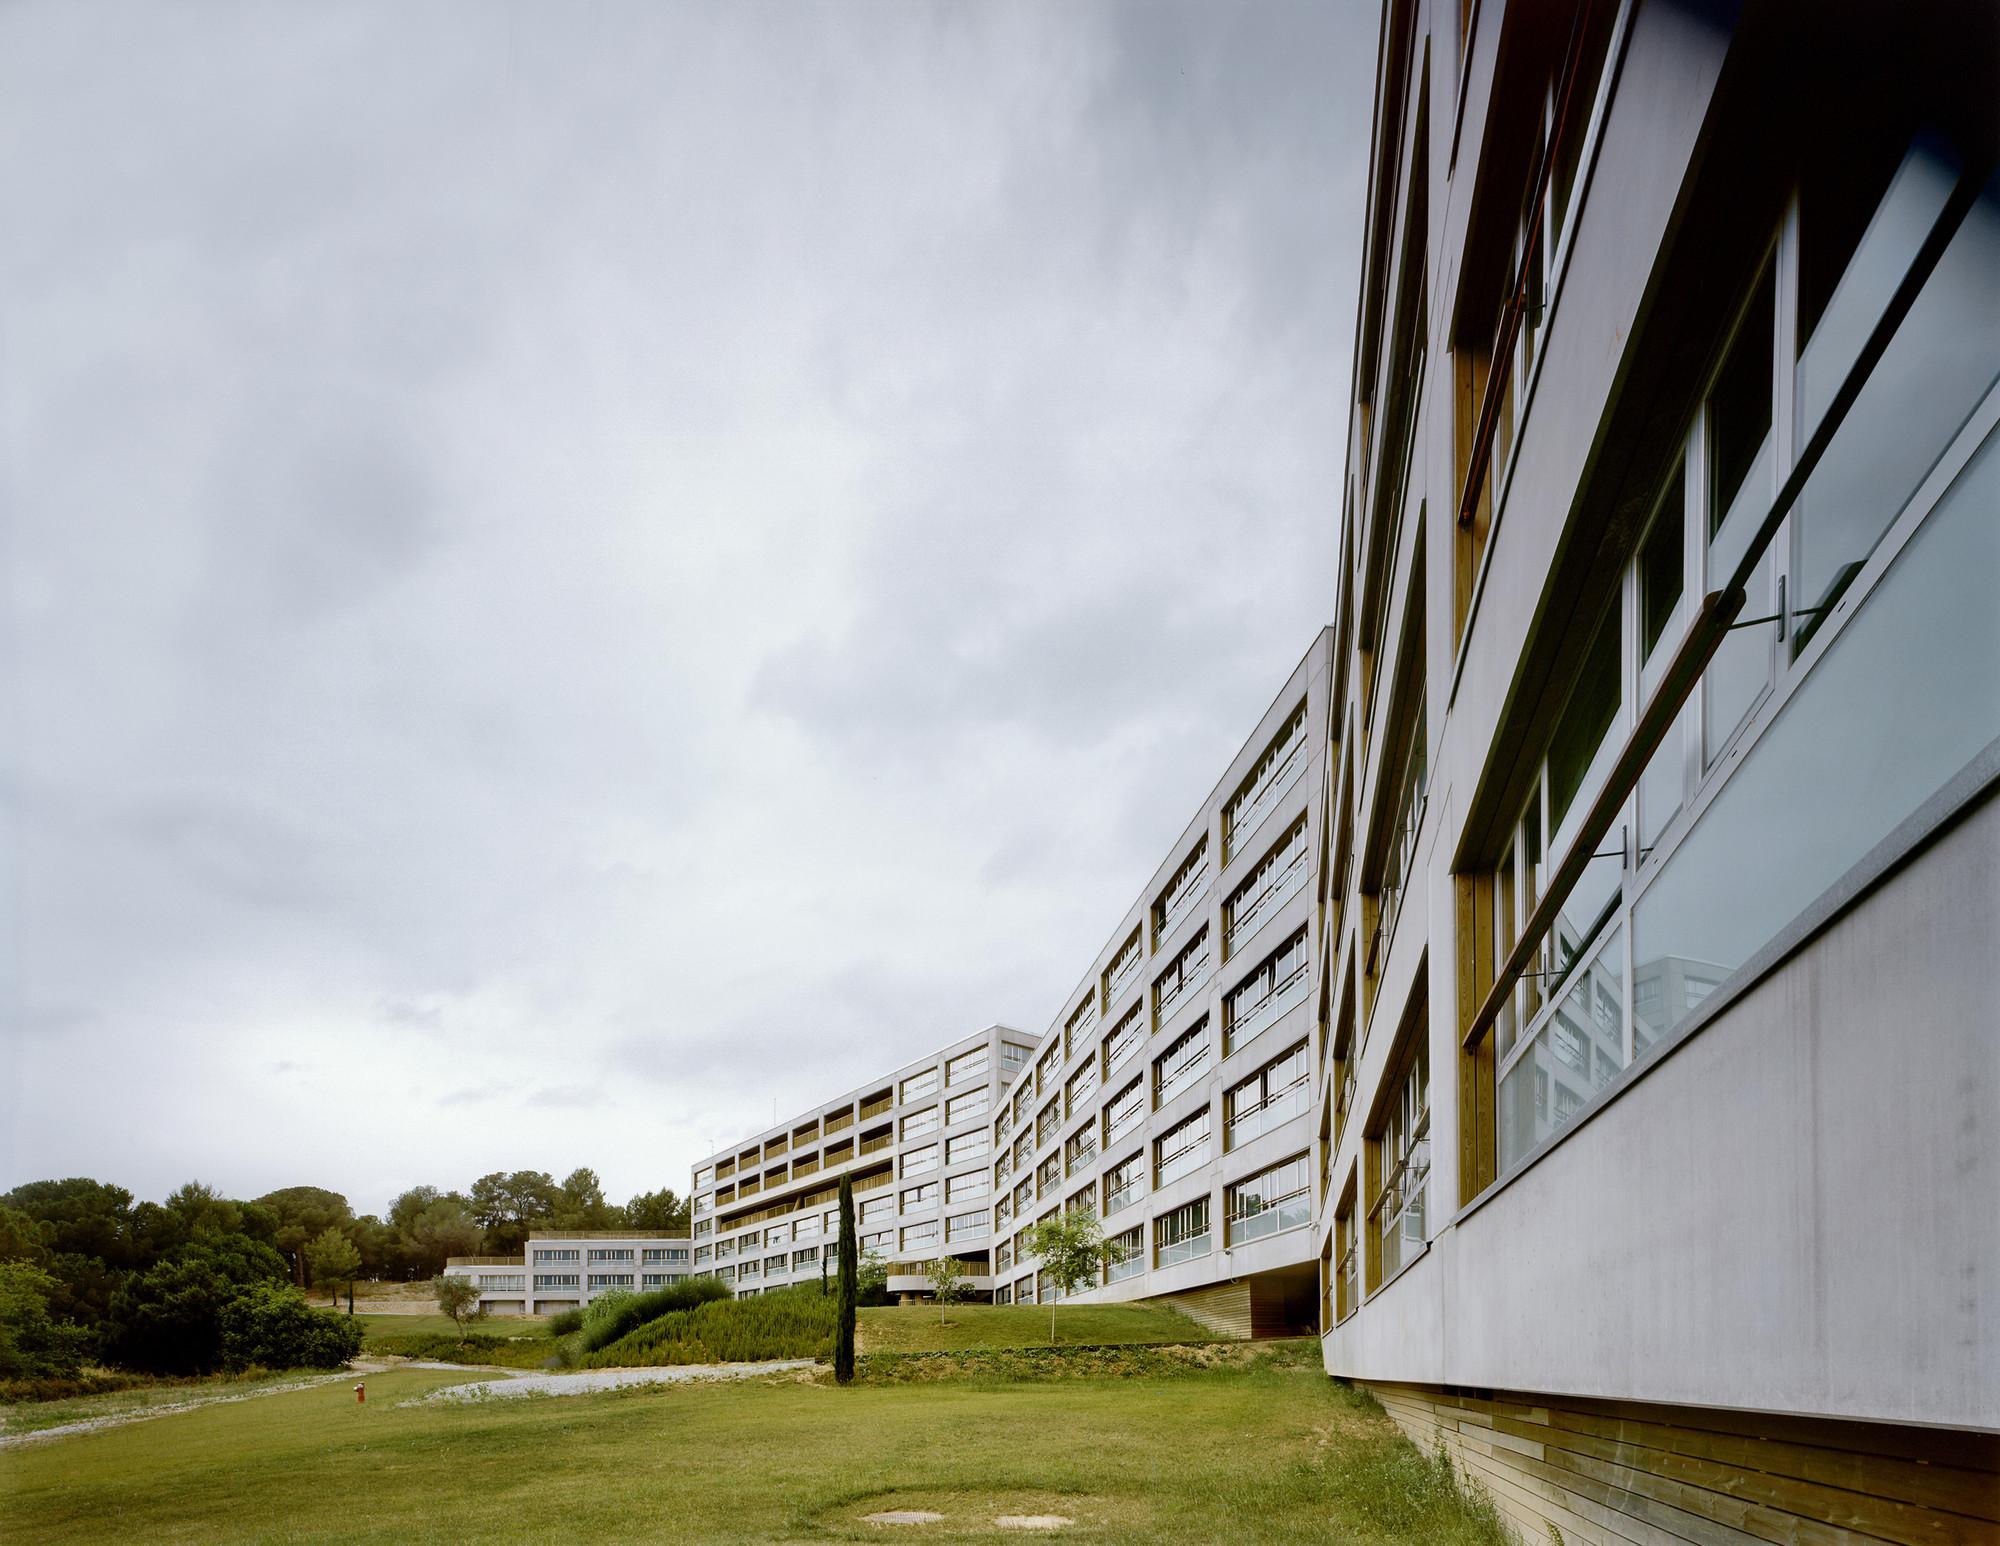 216 Social Dwellings for students and professors in Cerdanyola del Vallés / Bru Lacomba Setoain, © J. Bernadó